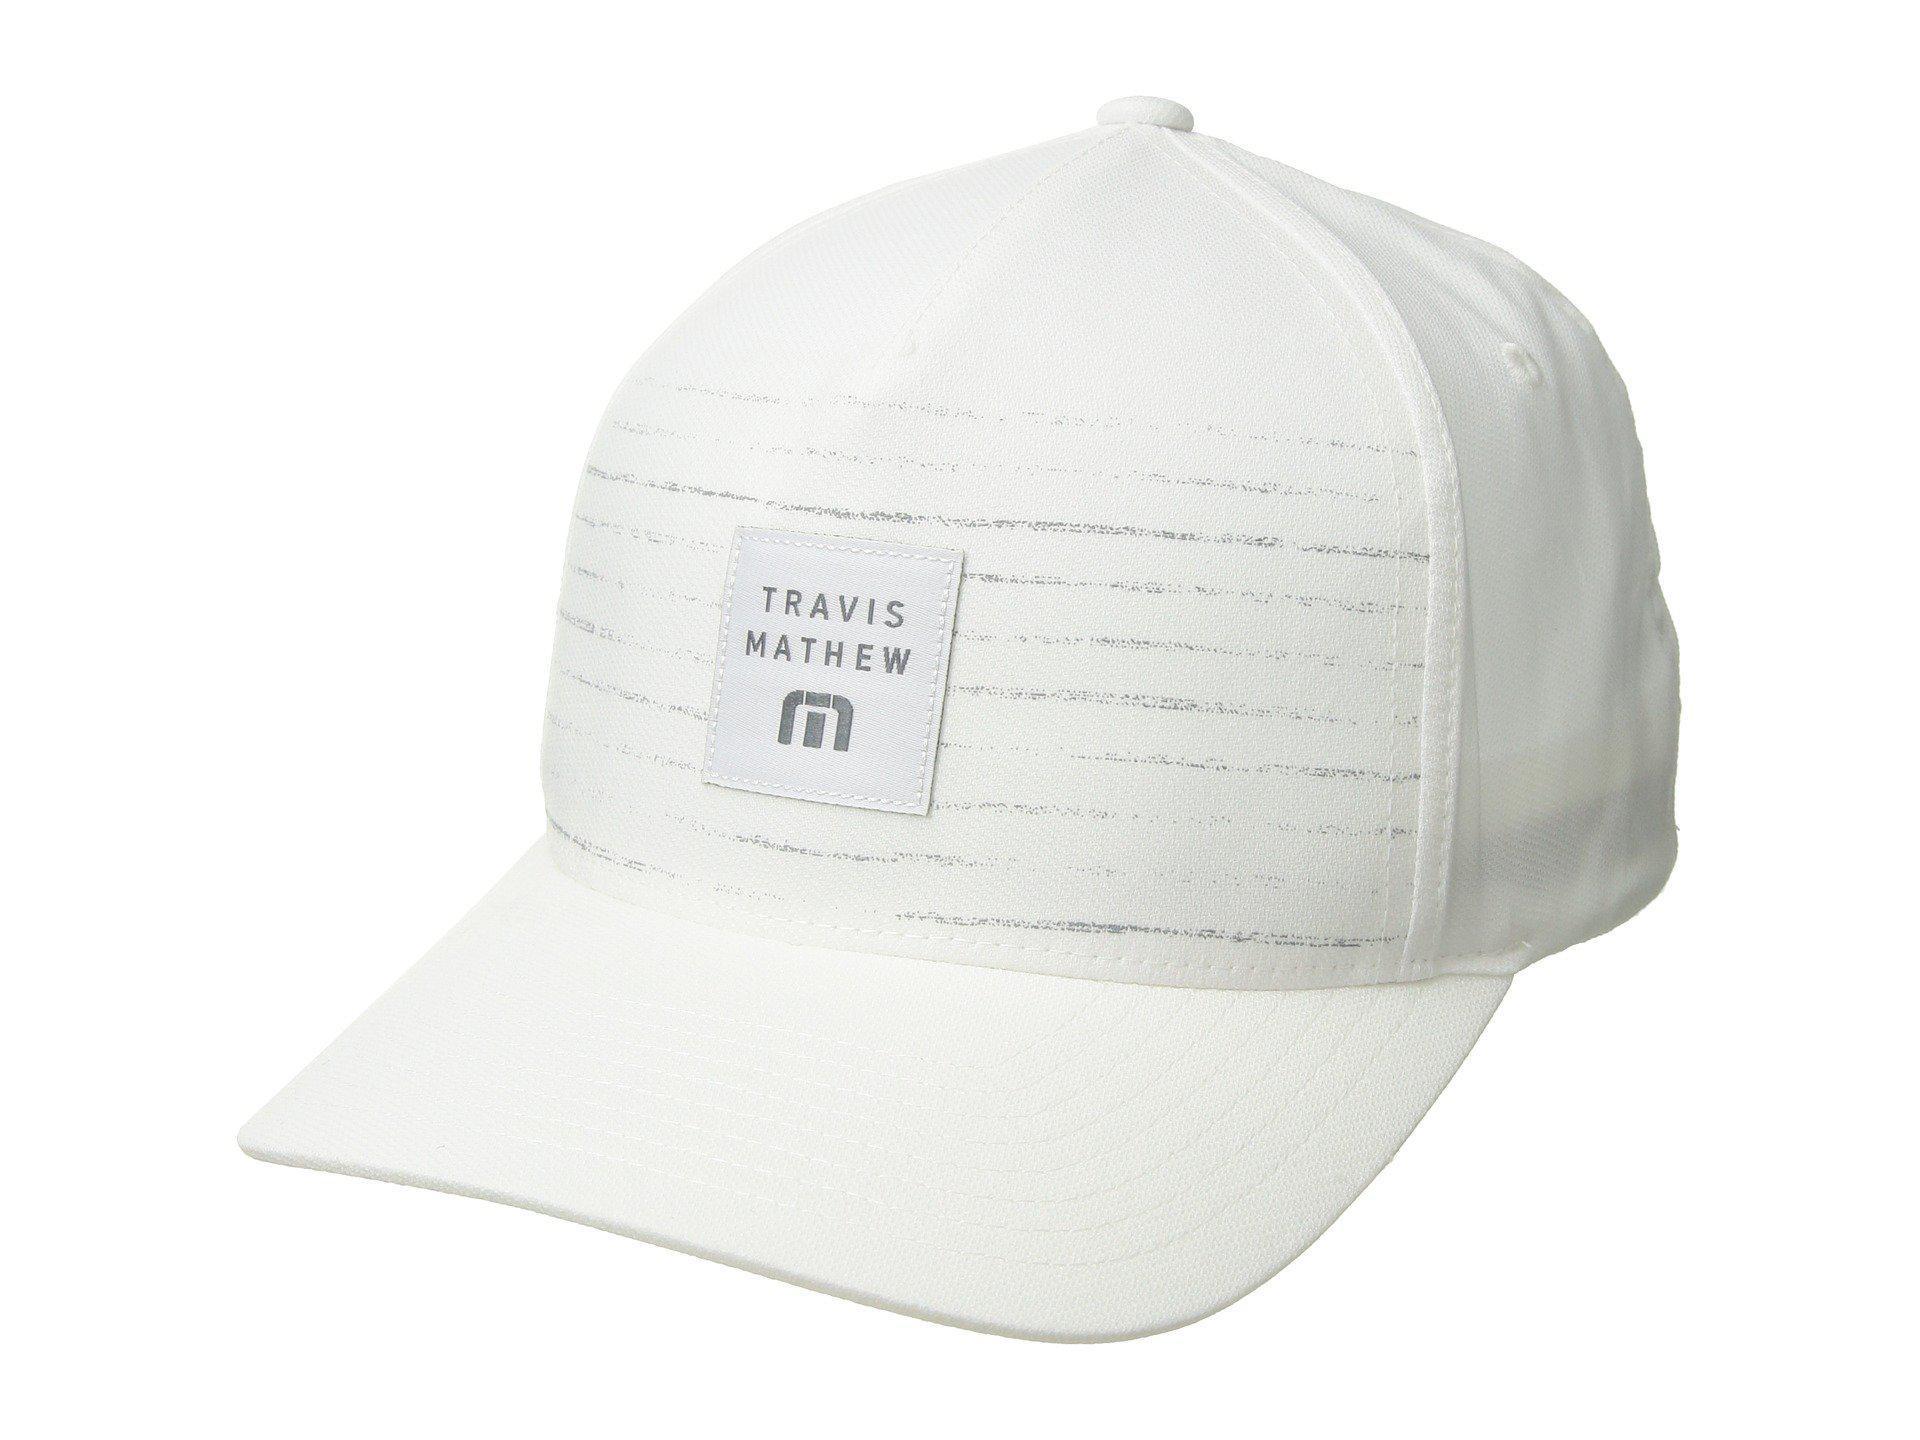 Lyst - Travis Mathew Edmiston (black) Baseball Caps in White for Men 985fa57f044f